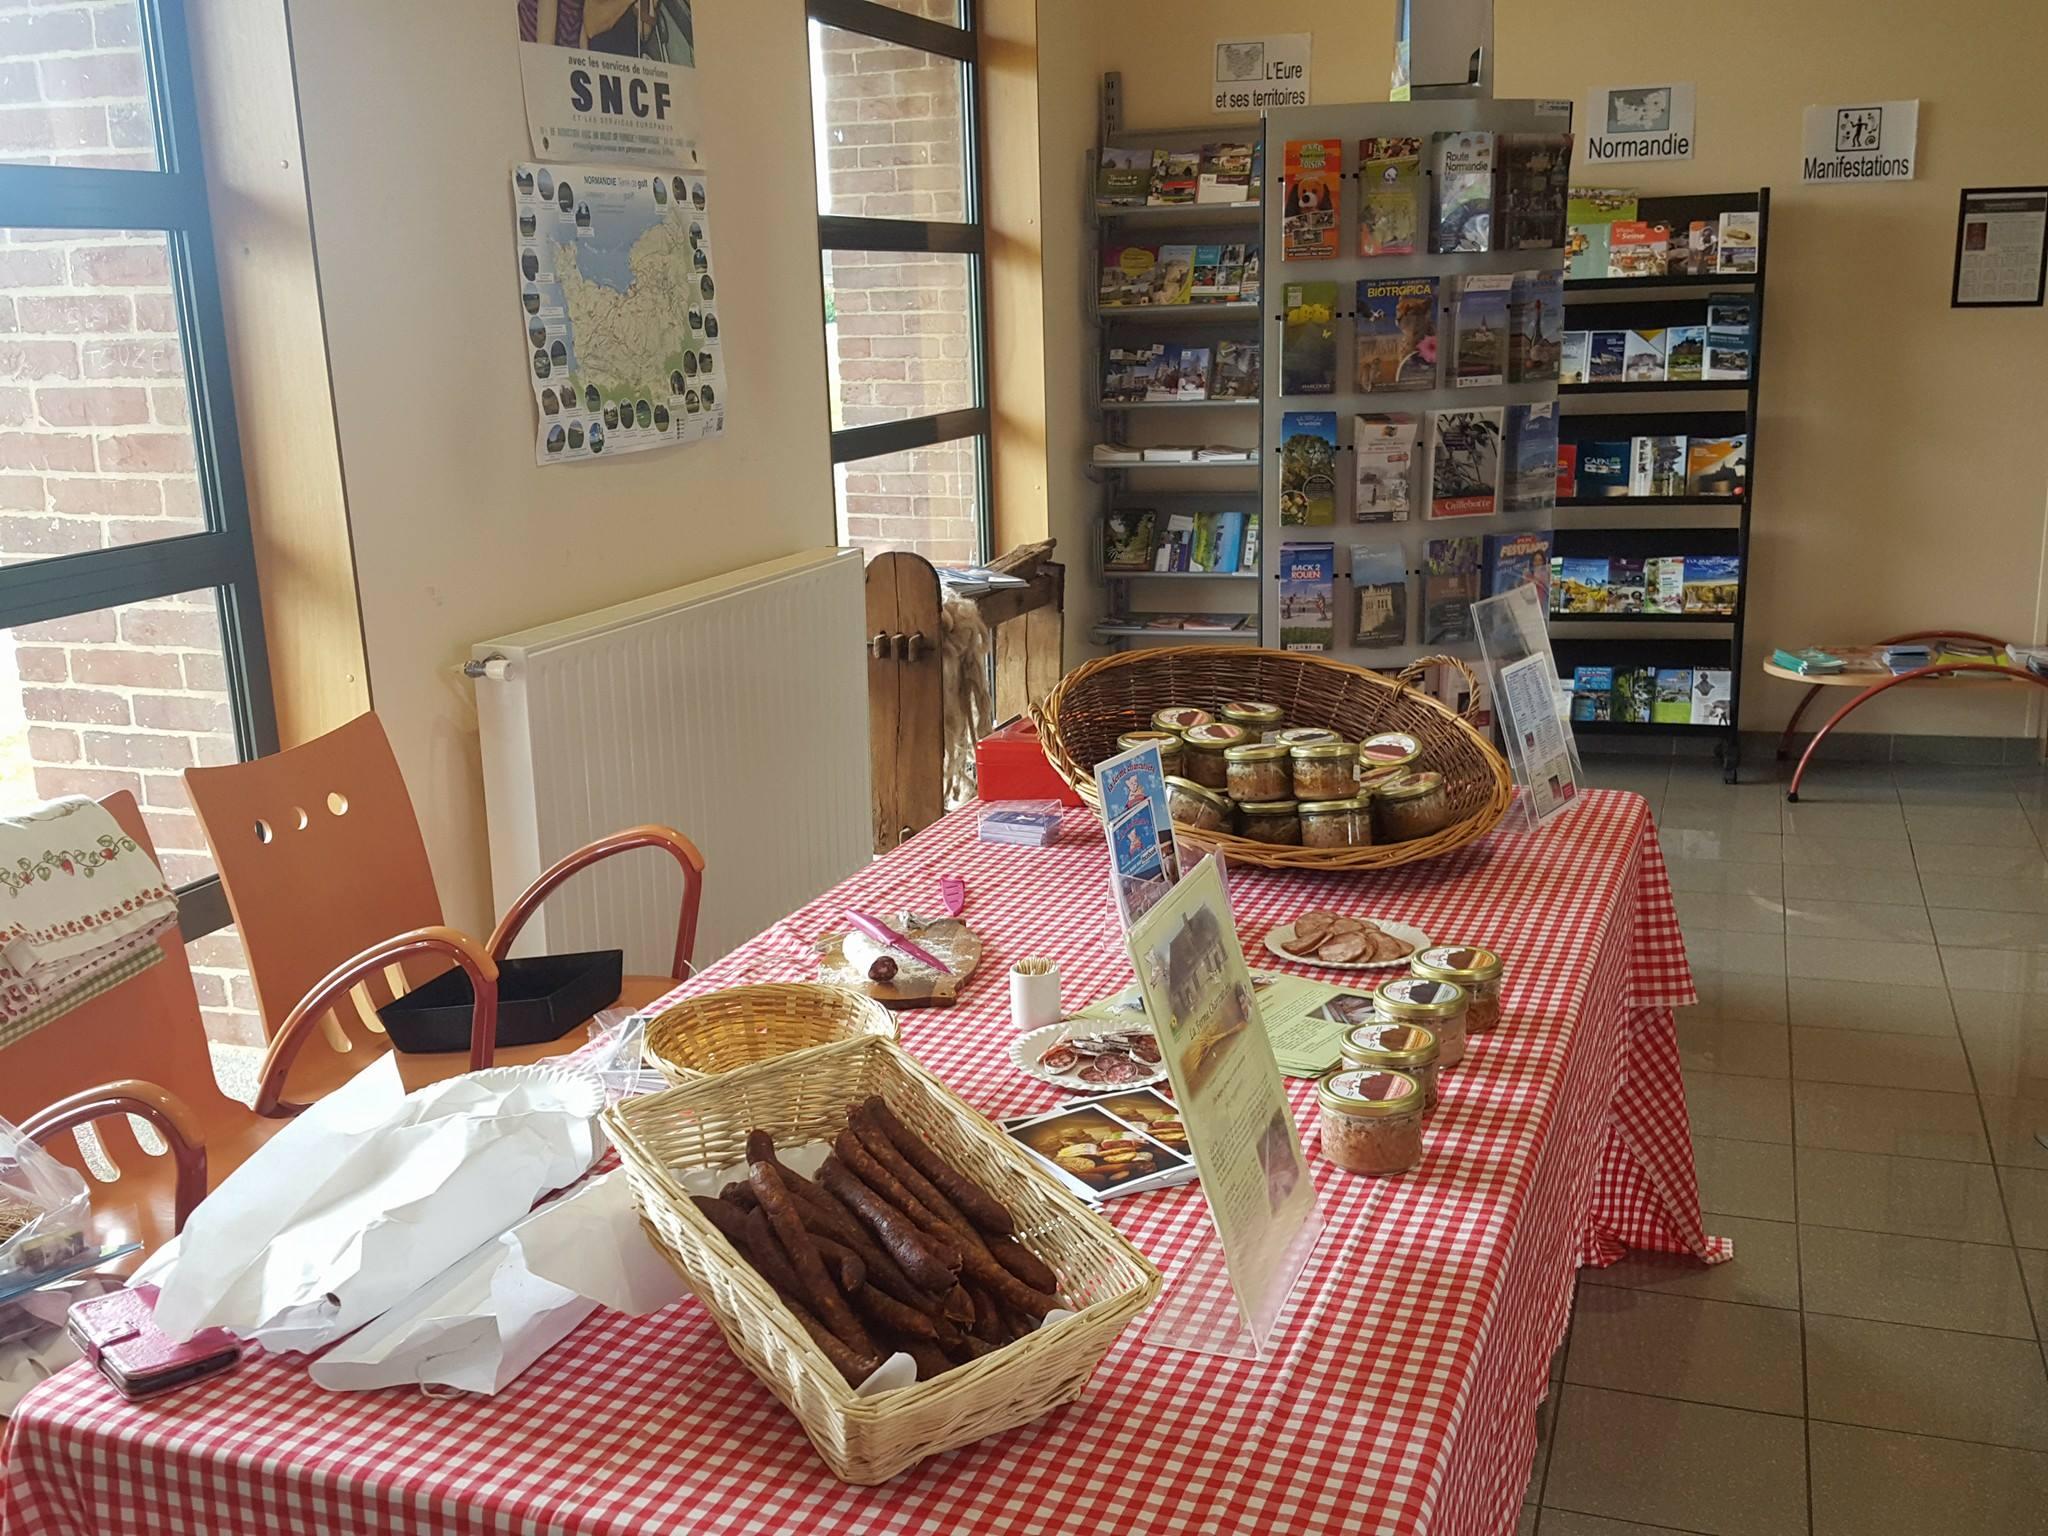 Mercredi gourmand Le Neubourg office de tourisme